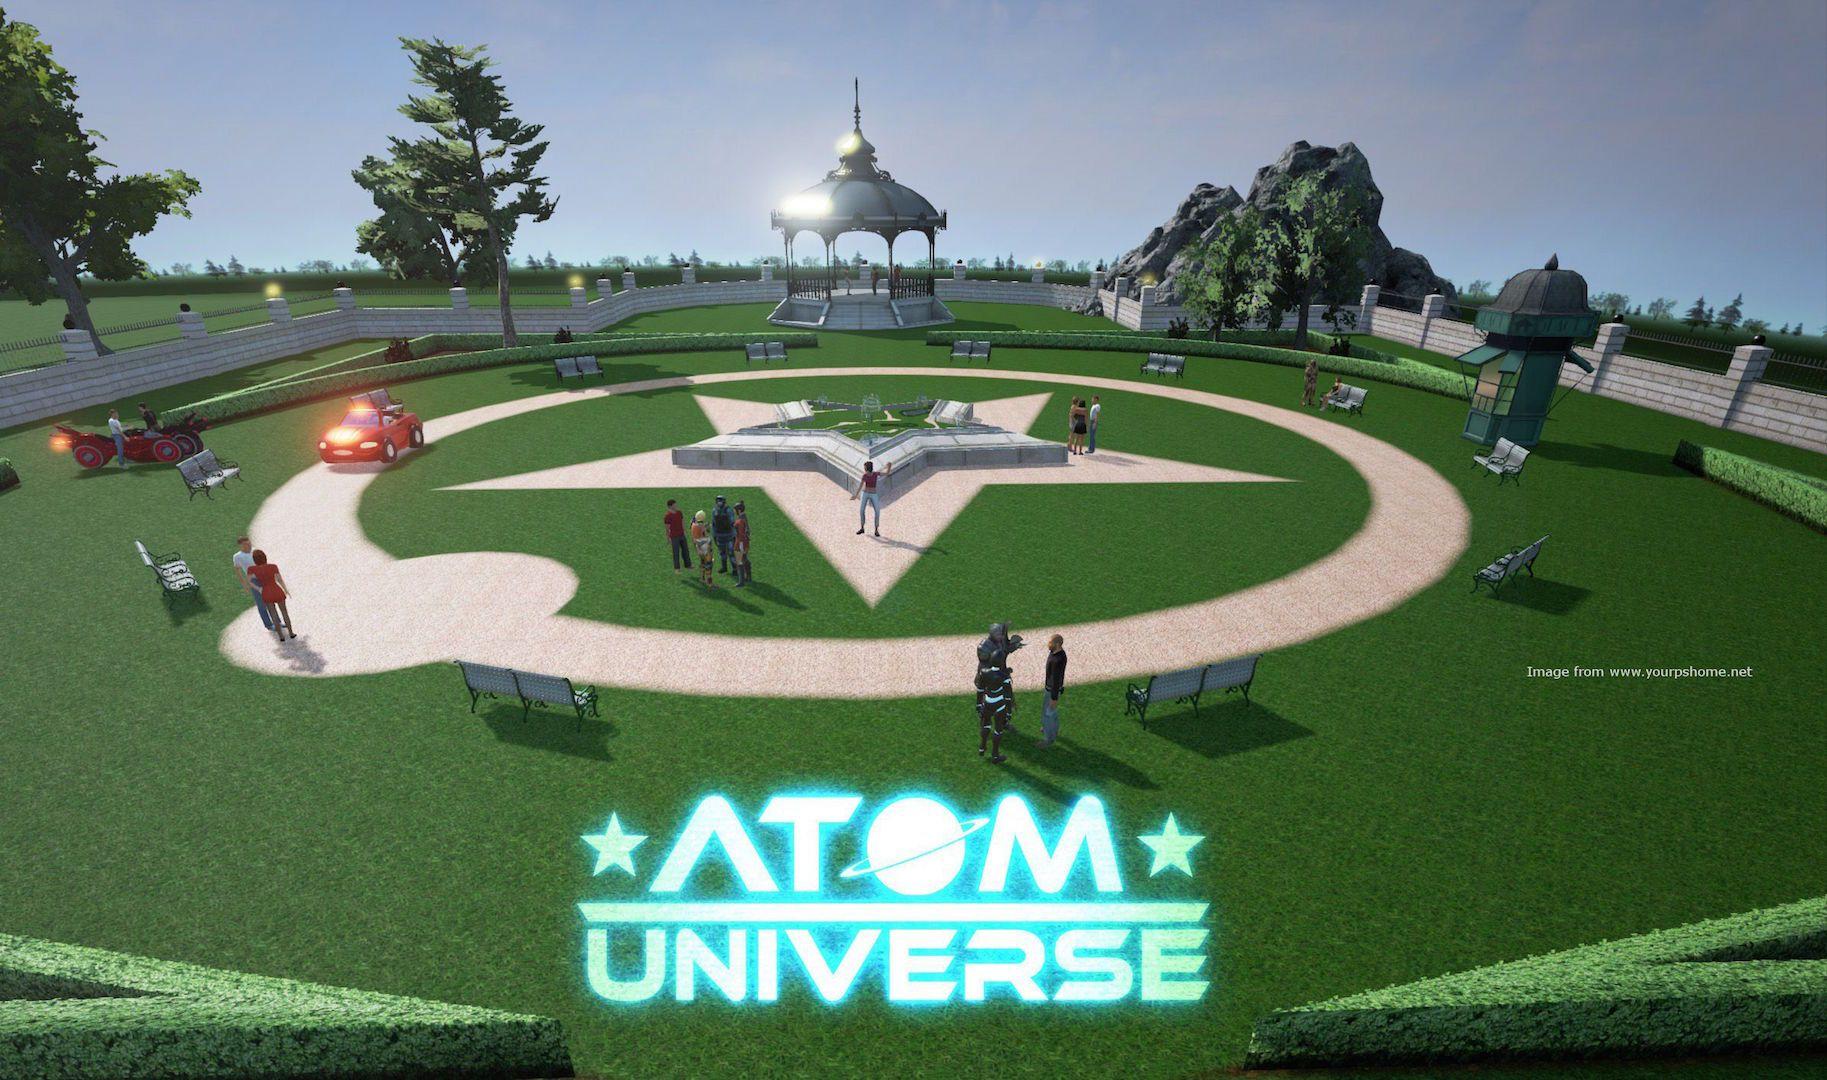 Karen Talks To Atom Republic About Atom Universe, kwoman32, Nov 30, 2014, 4:55 PM, YourPSHome.net, jpg, PublicPark-copy.jpg